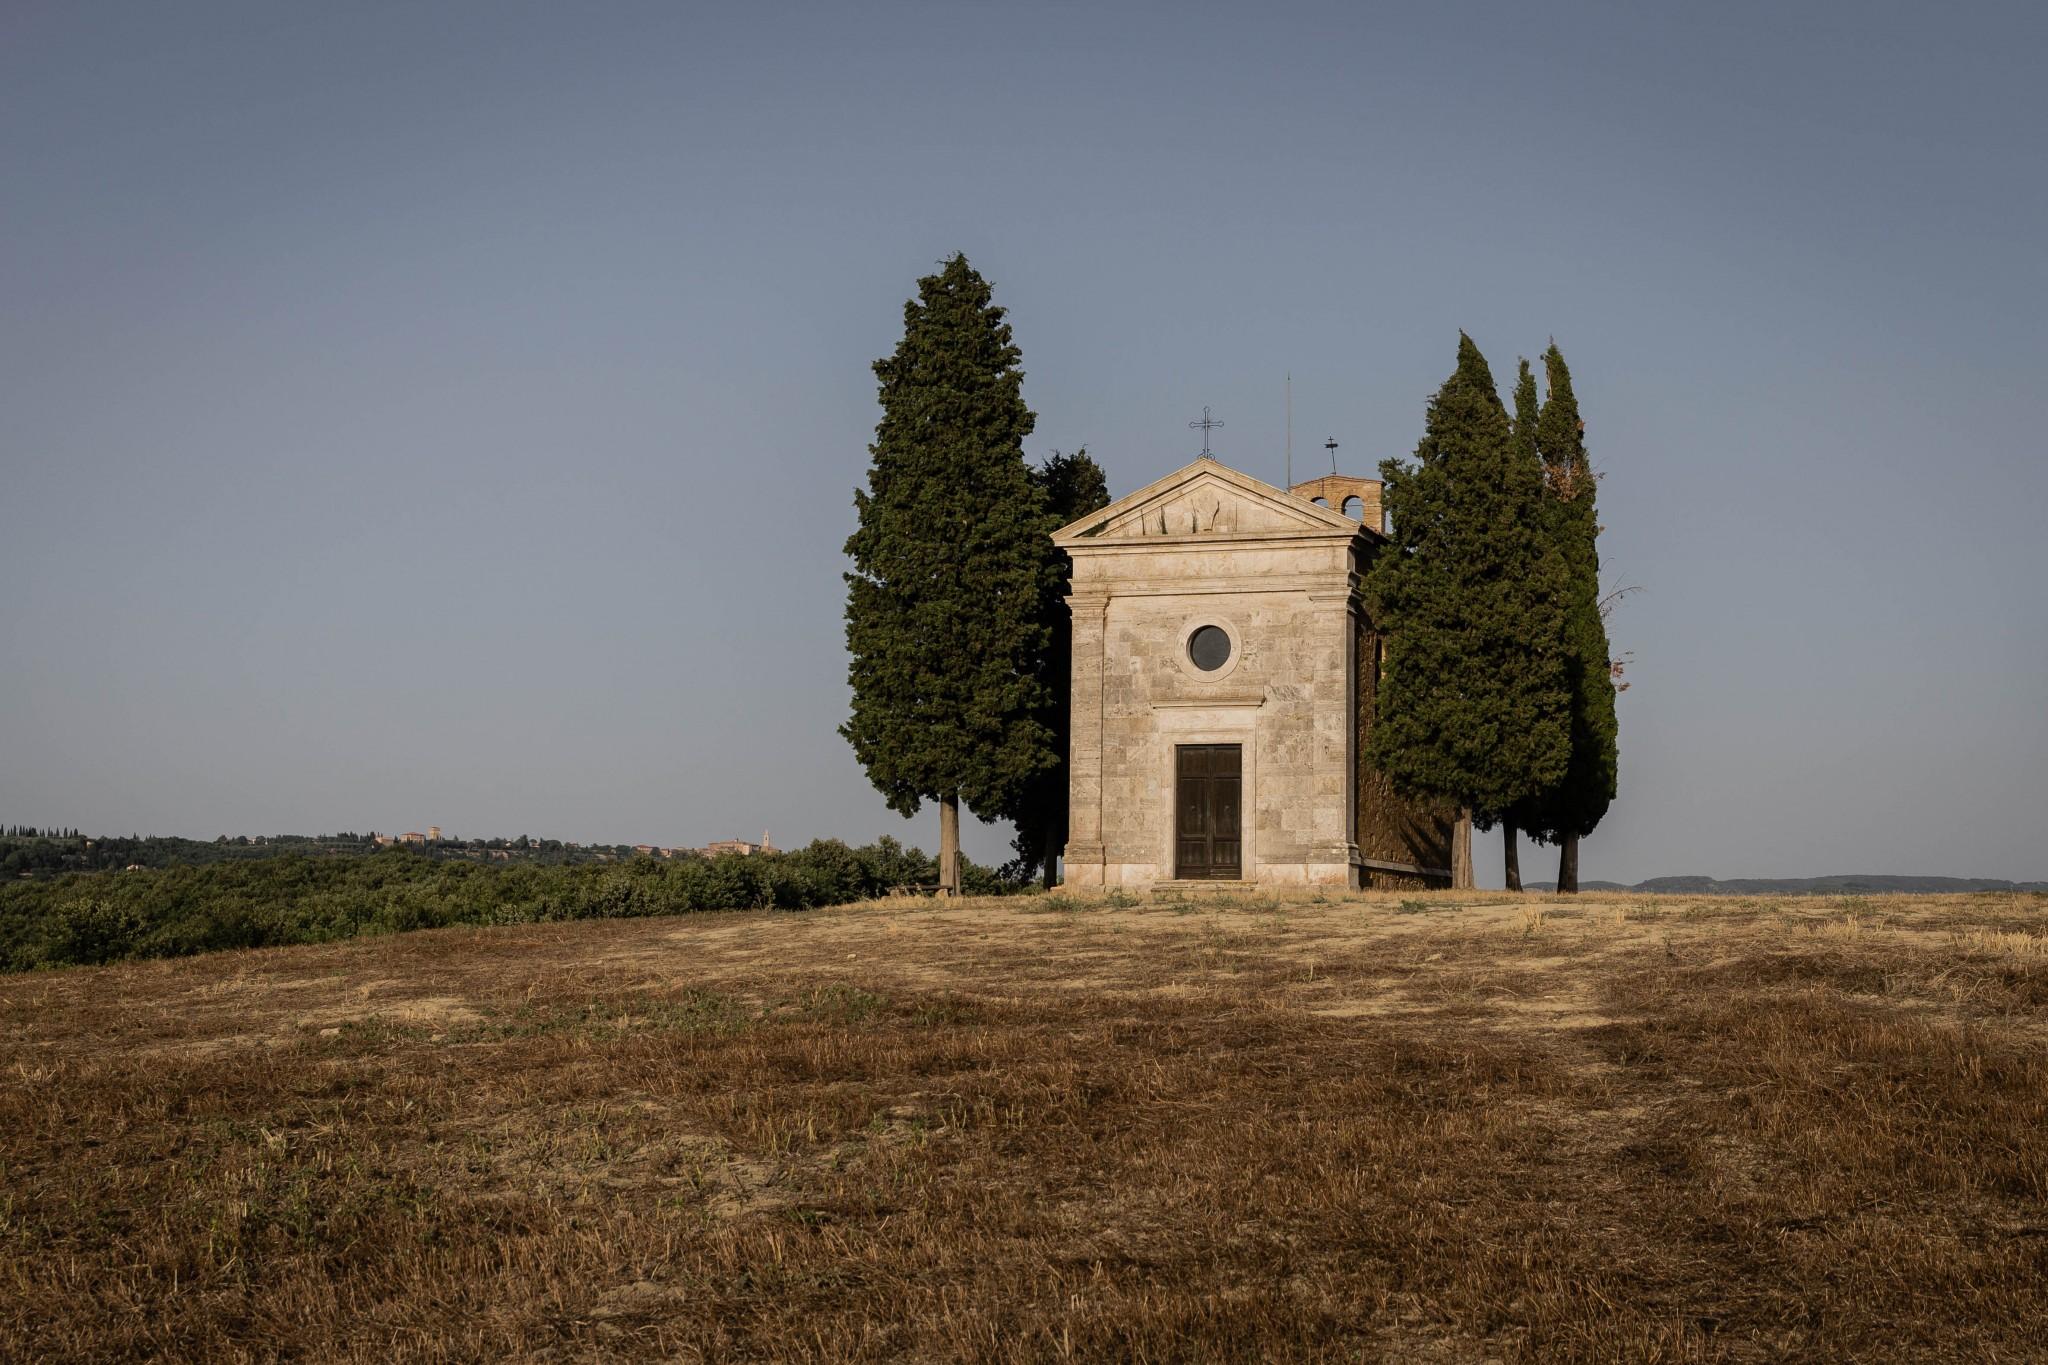 tuscany2 (32 of 39)